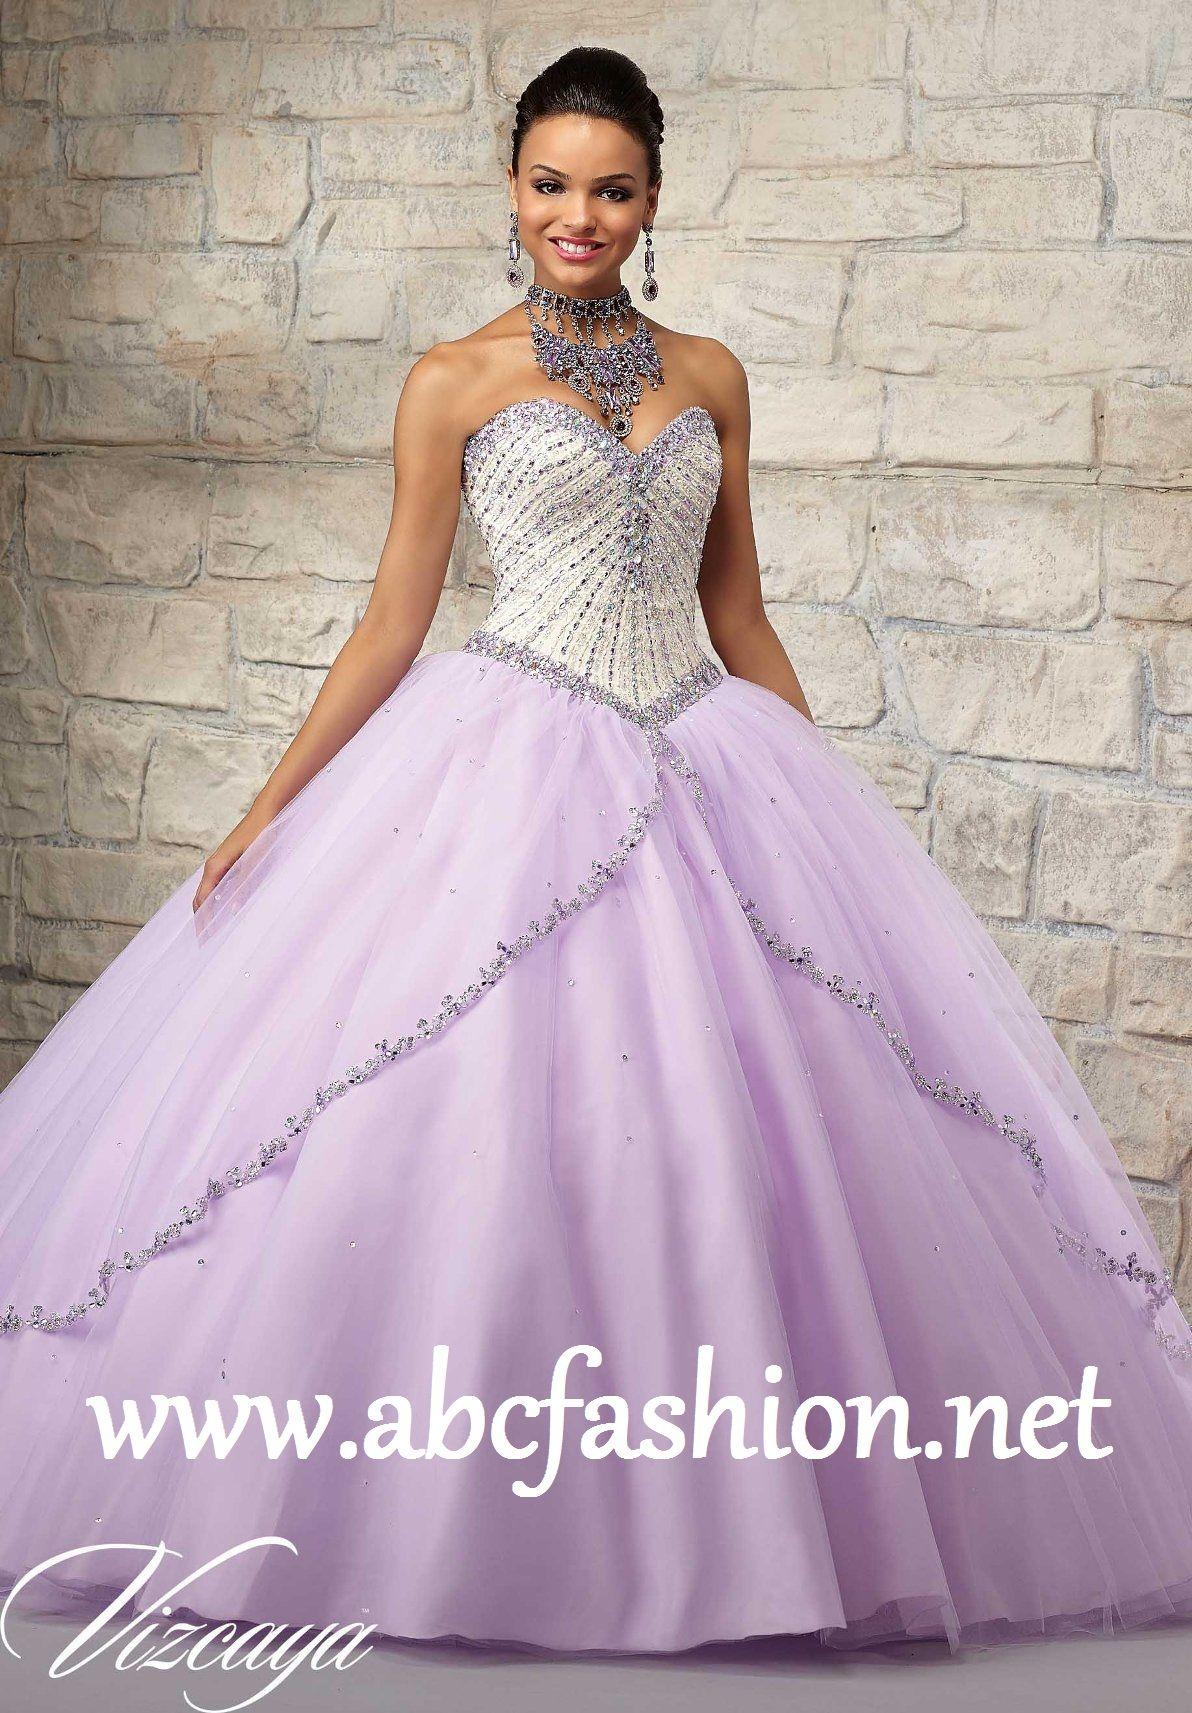 Mori Lee Quinceanera Dresses Style 89025 Colors: Champagne/Light Purple, Champagne/Coral, Champagne/Blush http://www.abcfashion.net/mori-lee-quinceanera-dresses-89025.html